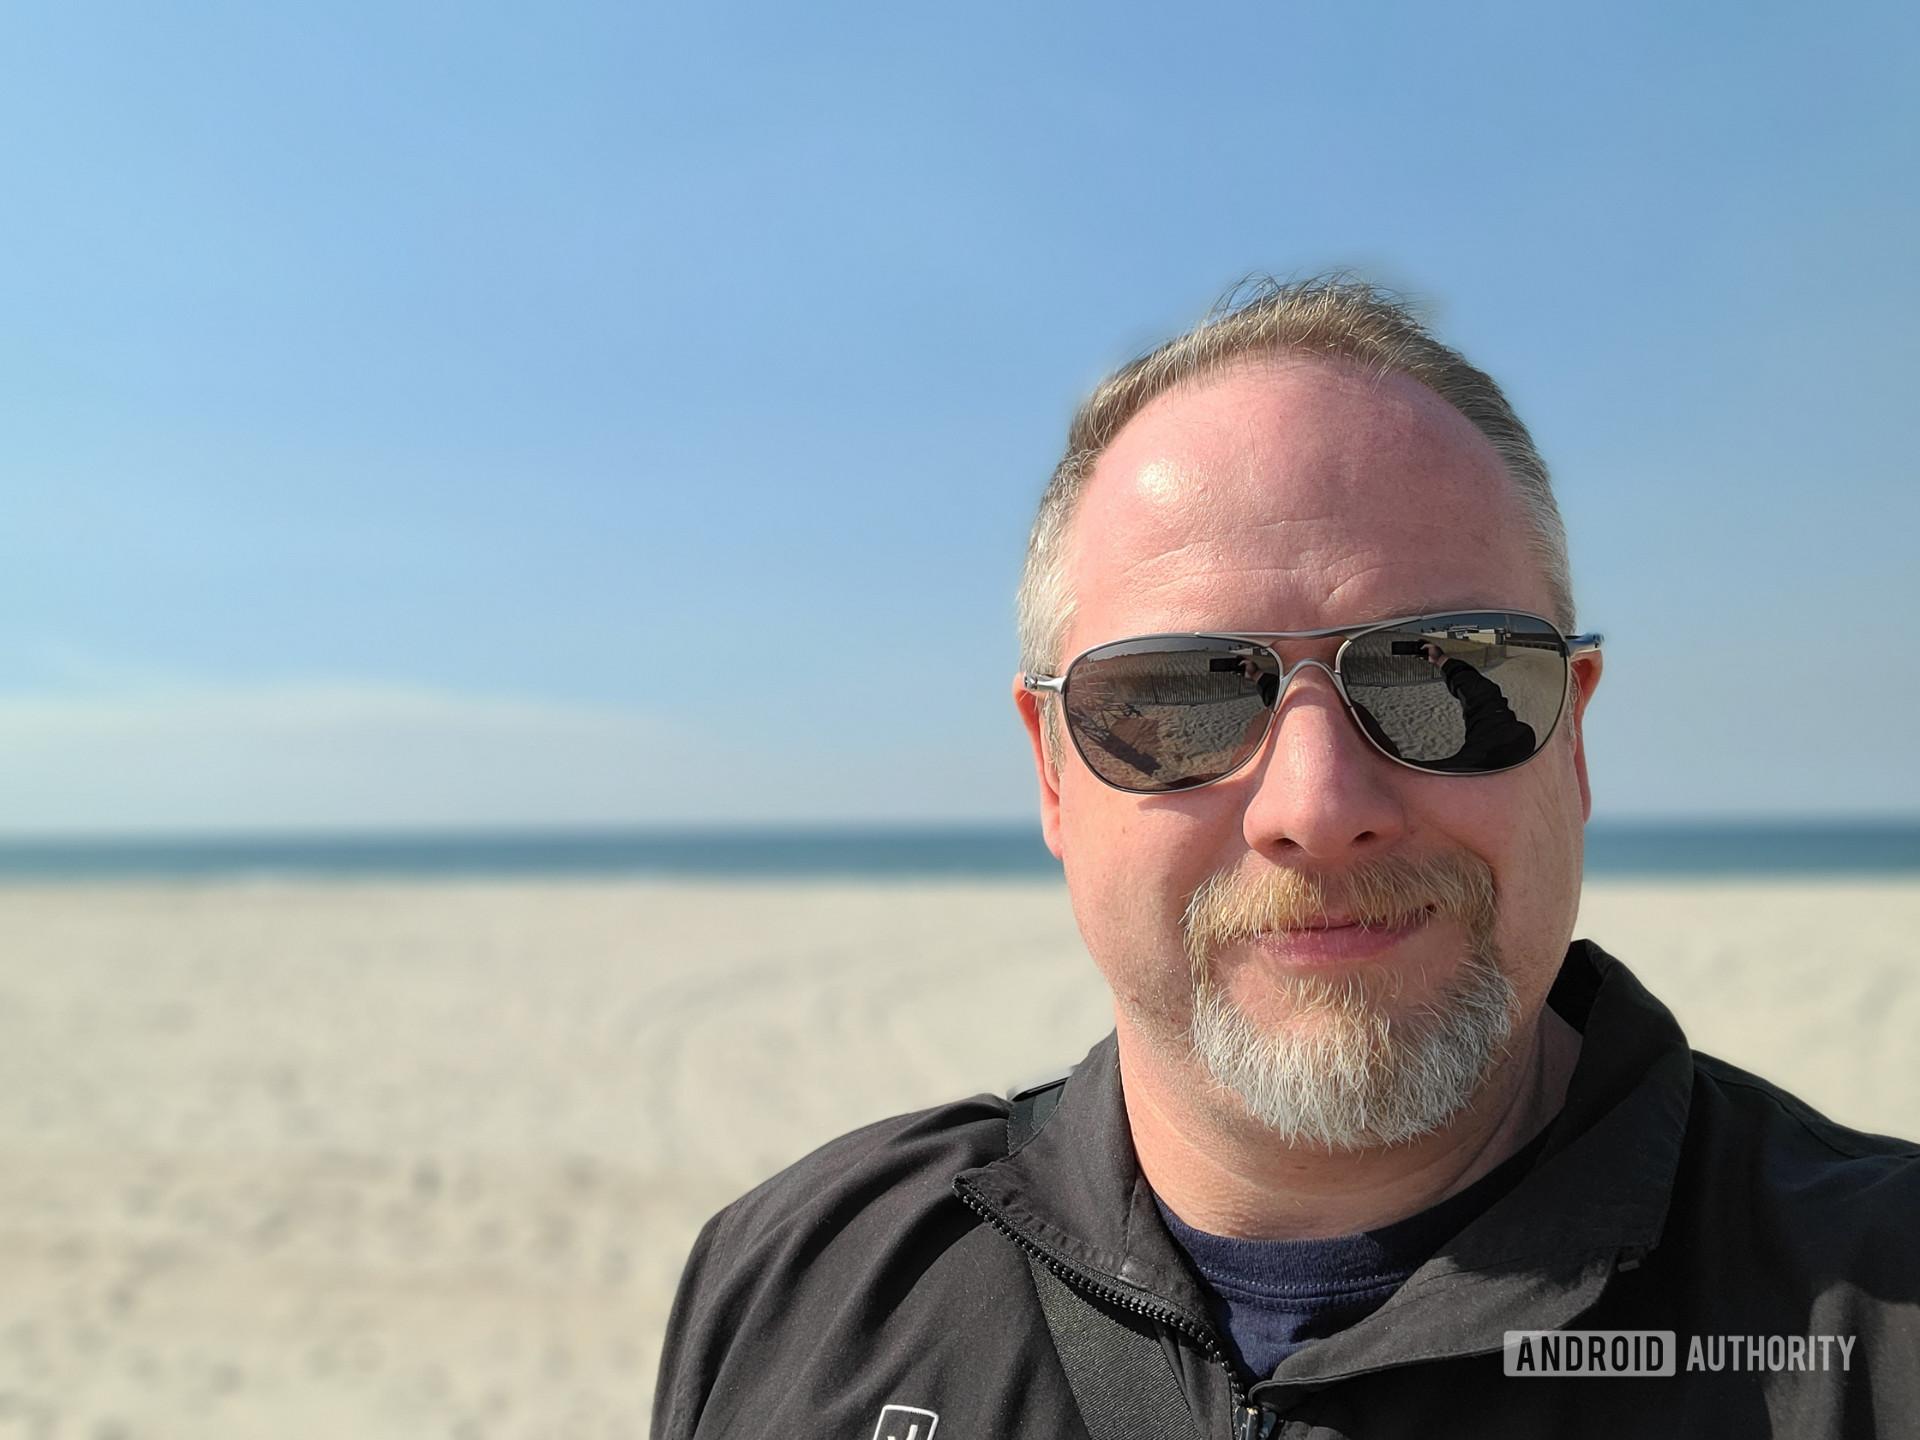 Samsung Galaxy S20 Ultra Photo Sample beach selfie